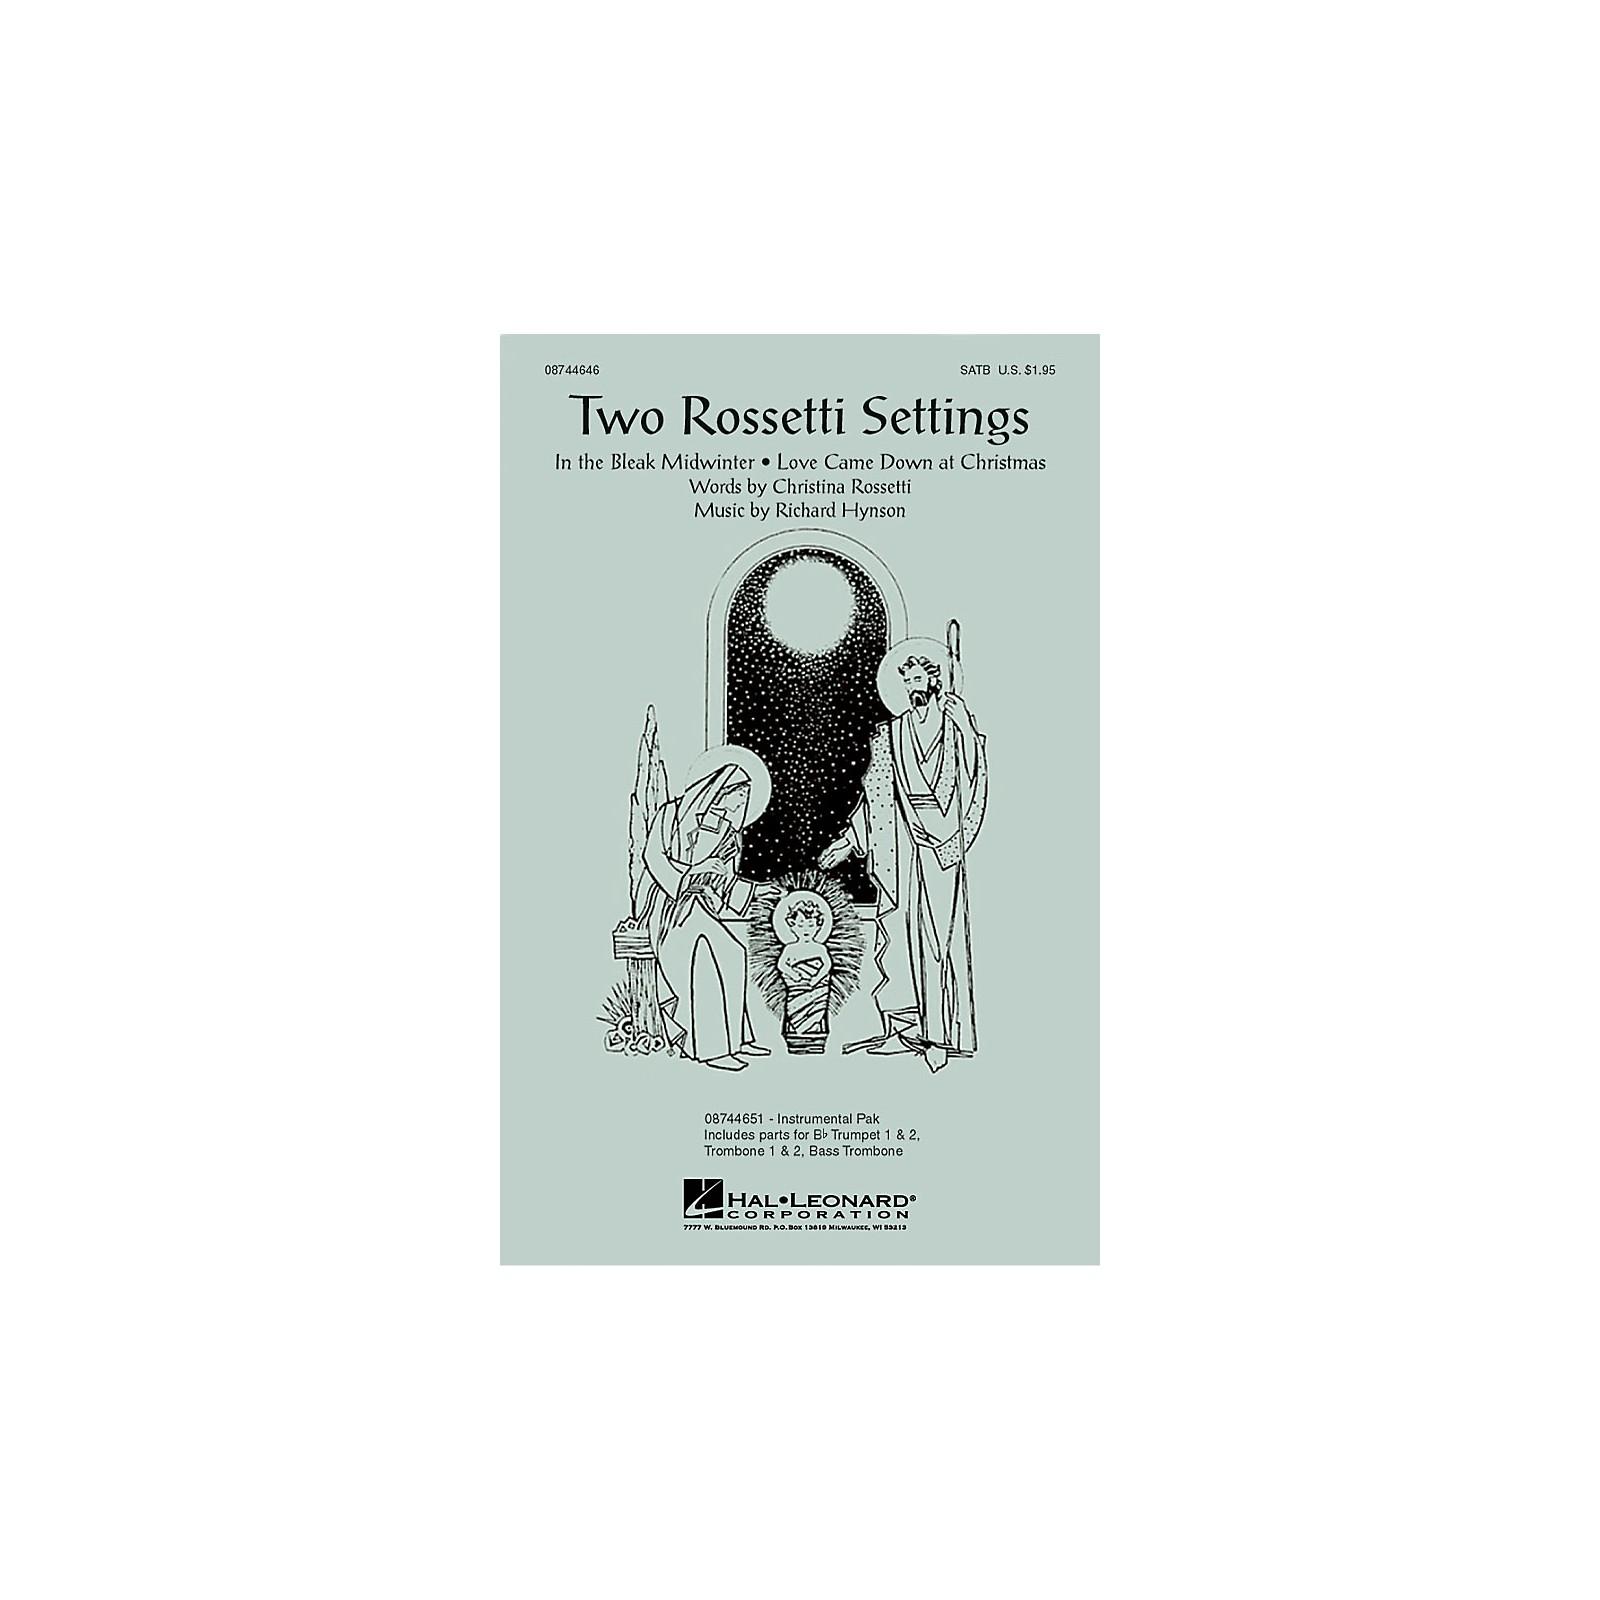 Hal Leonard Two Rossetti Settings IPAKB Composed by Richard Hynson